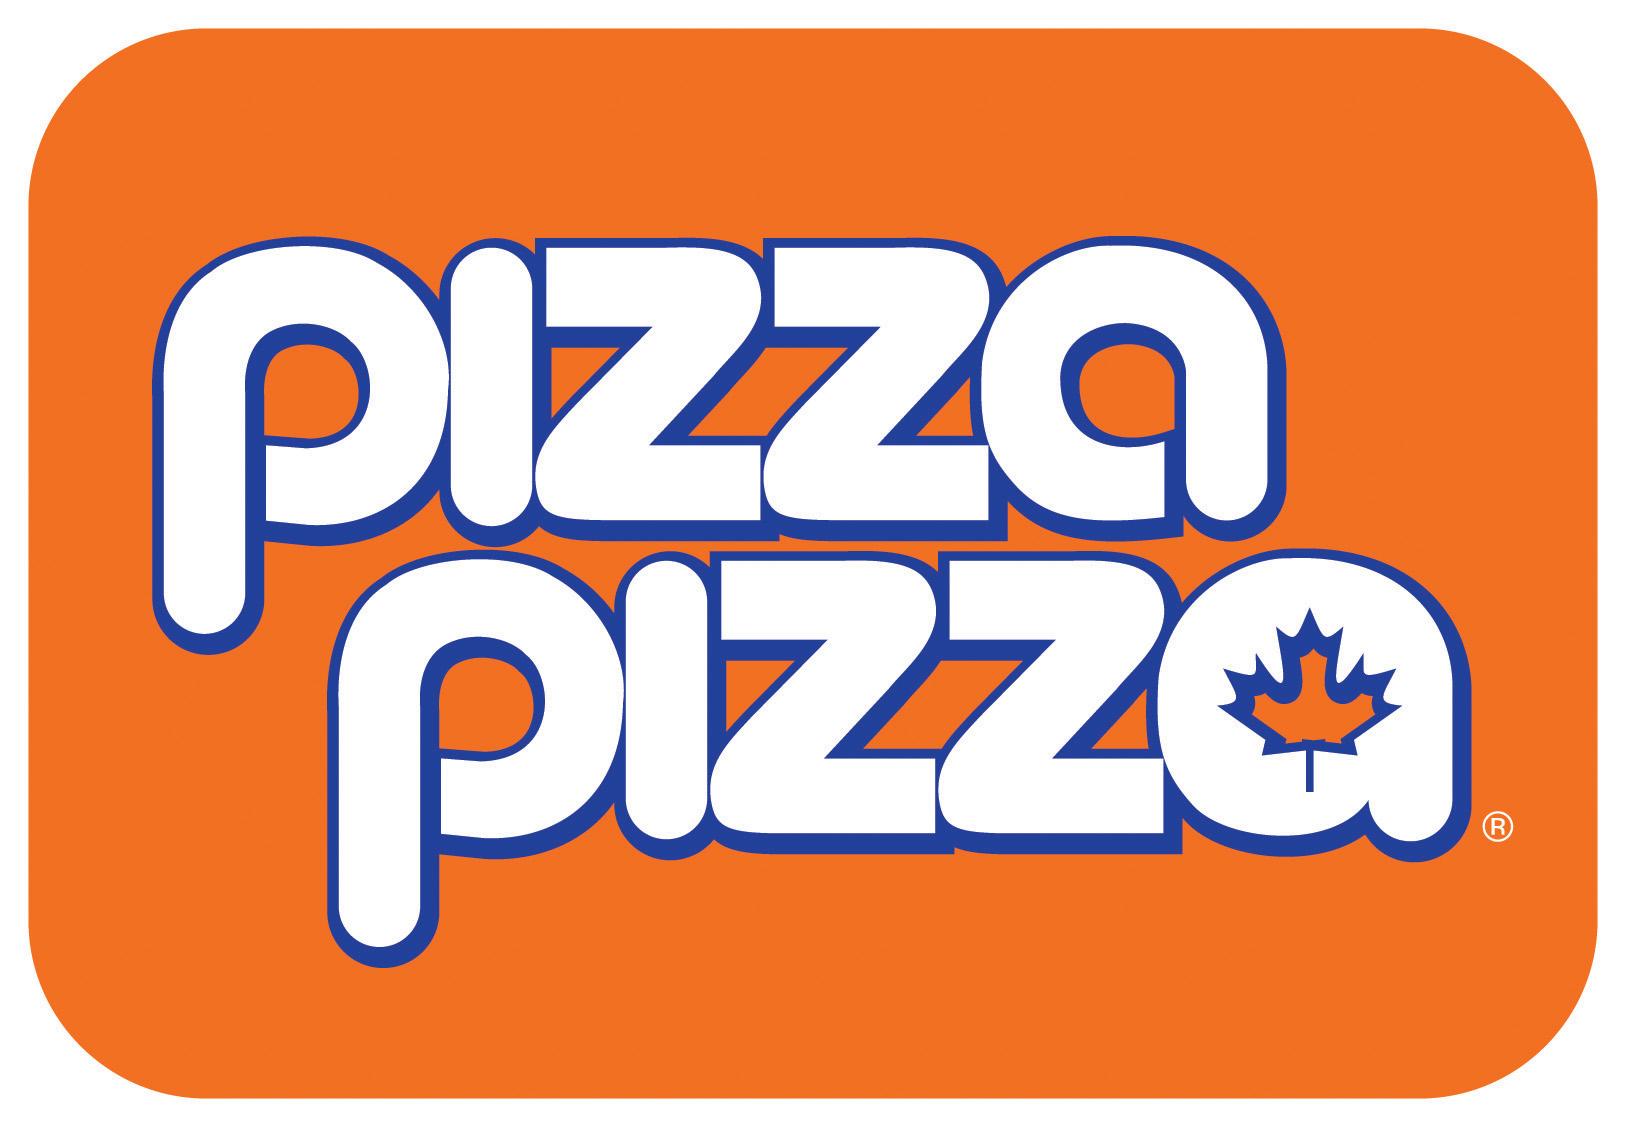 Pizza Pizza & The Rabbit Fox